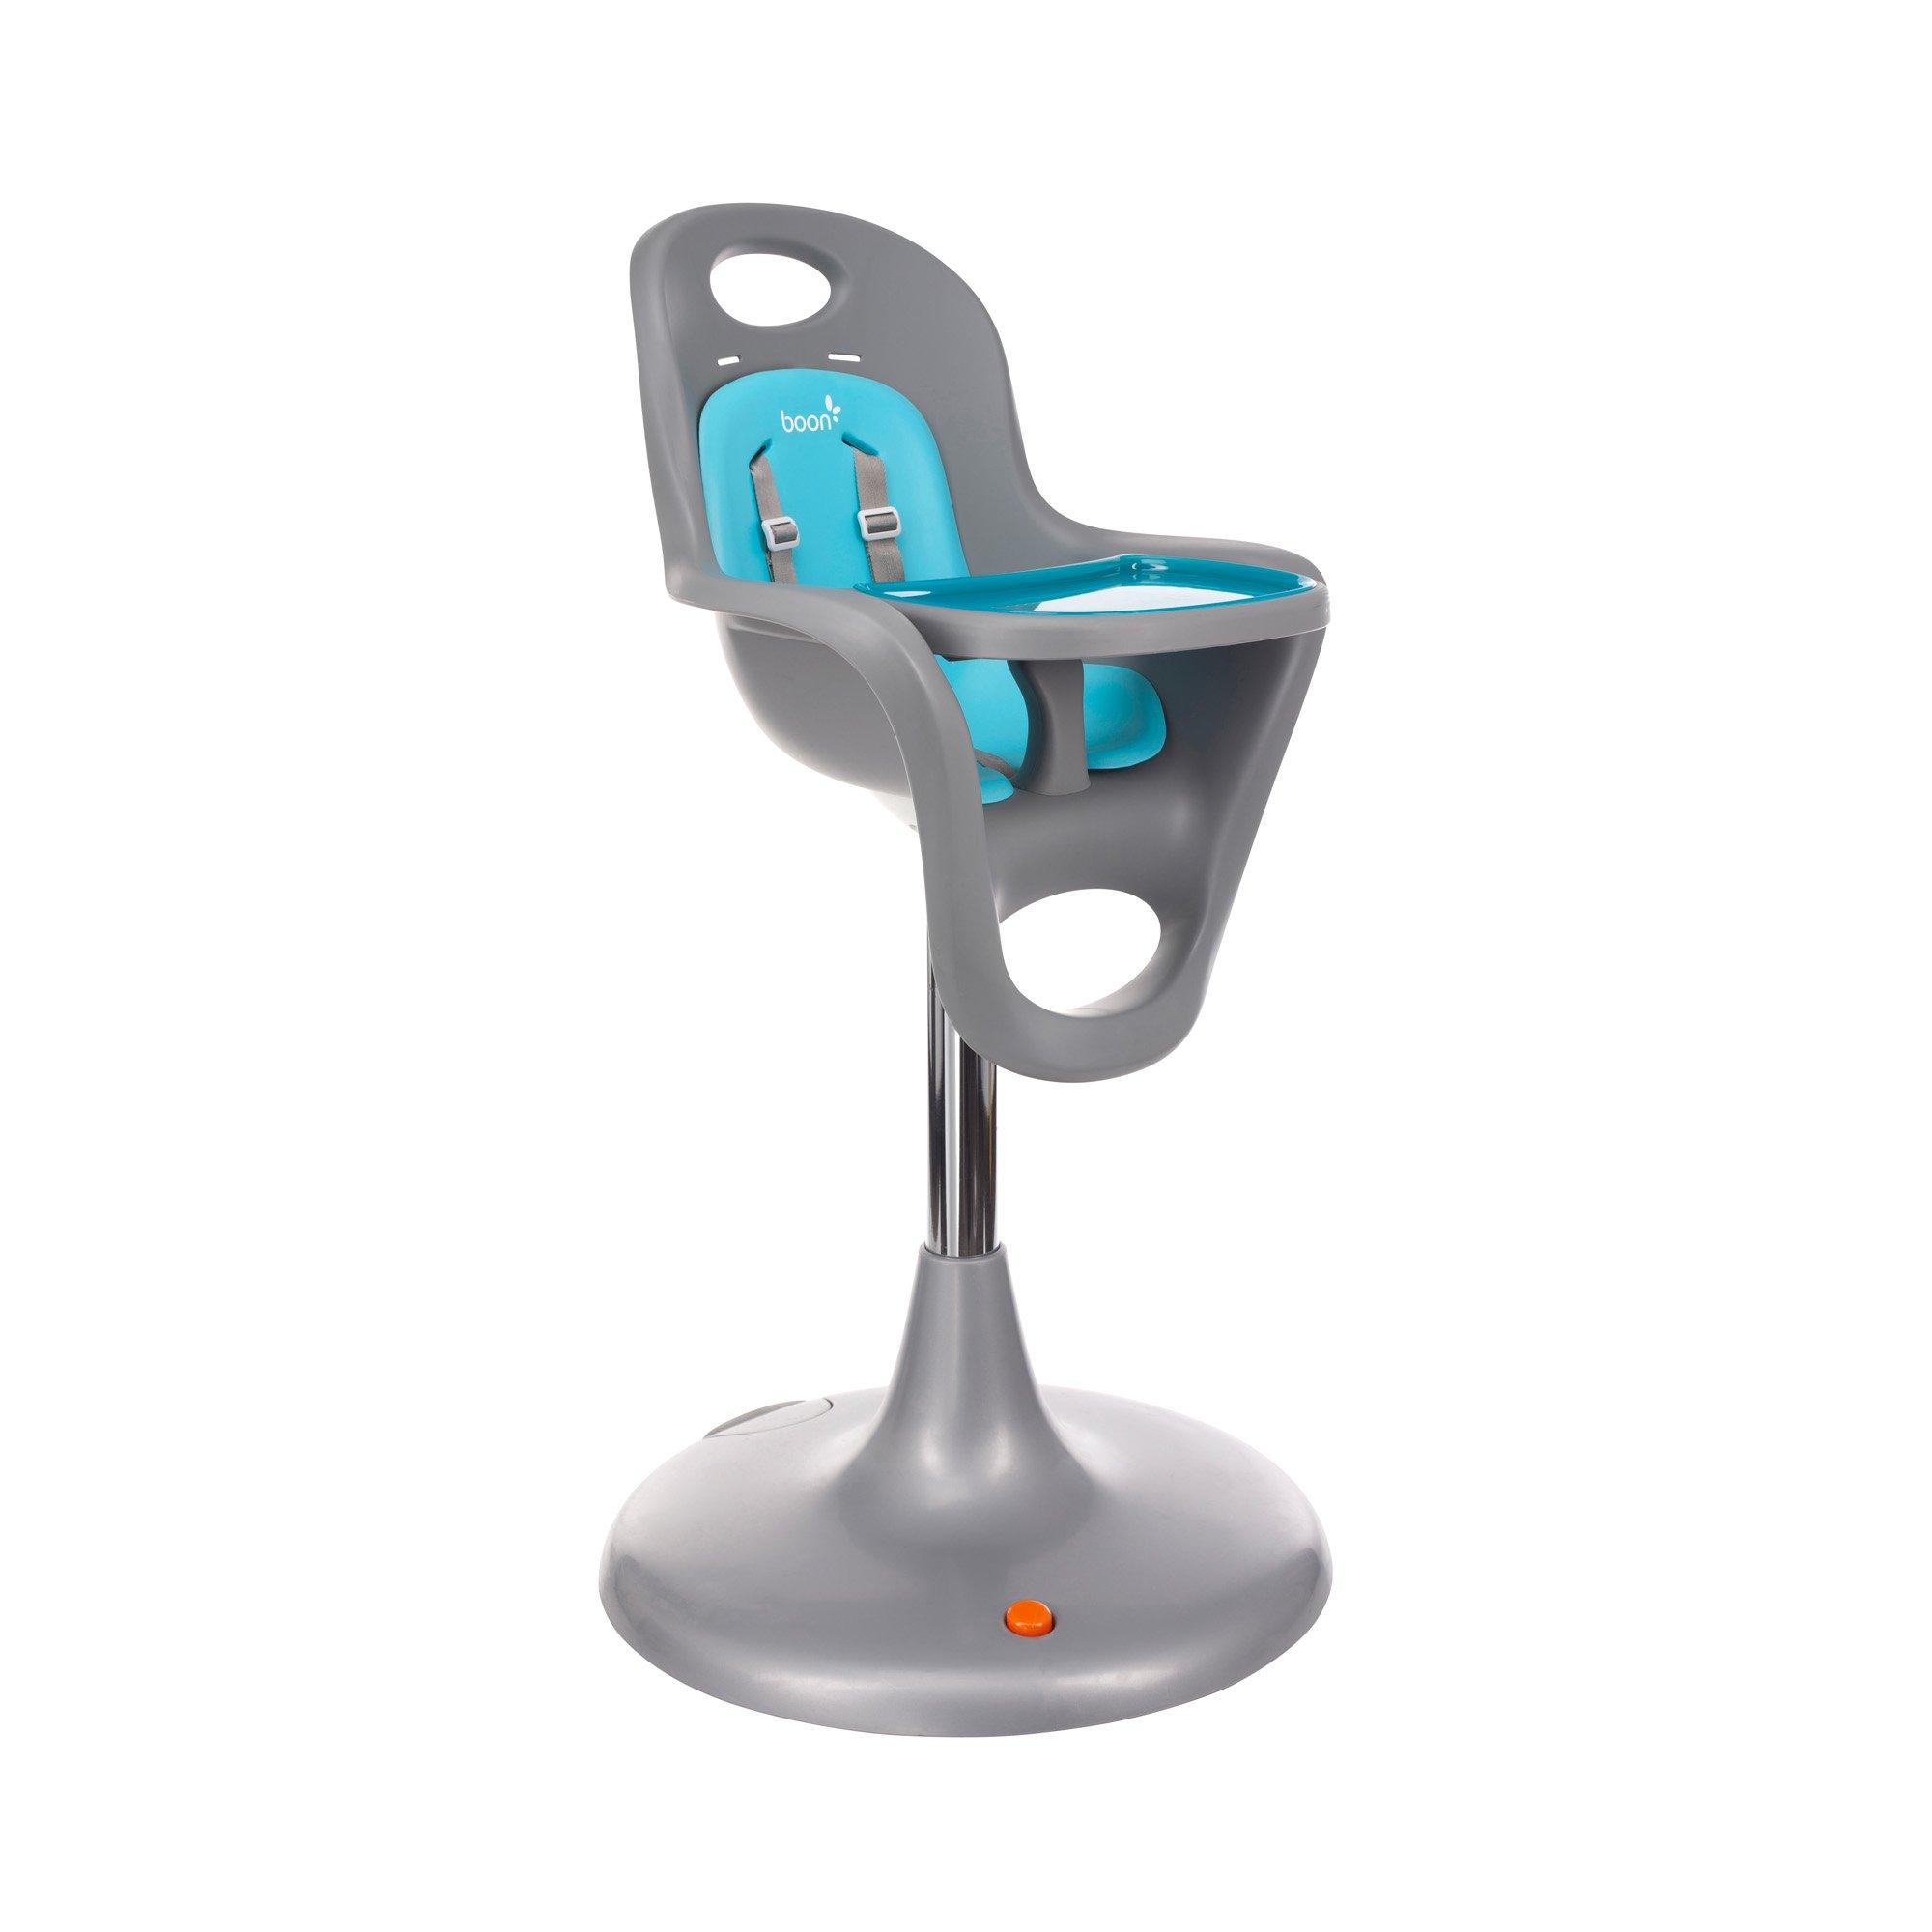 Boon Flair Pedestal Highchair, Blue/Gray